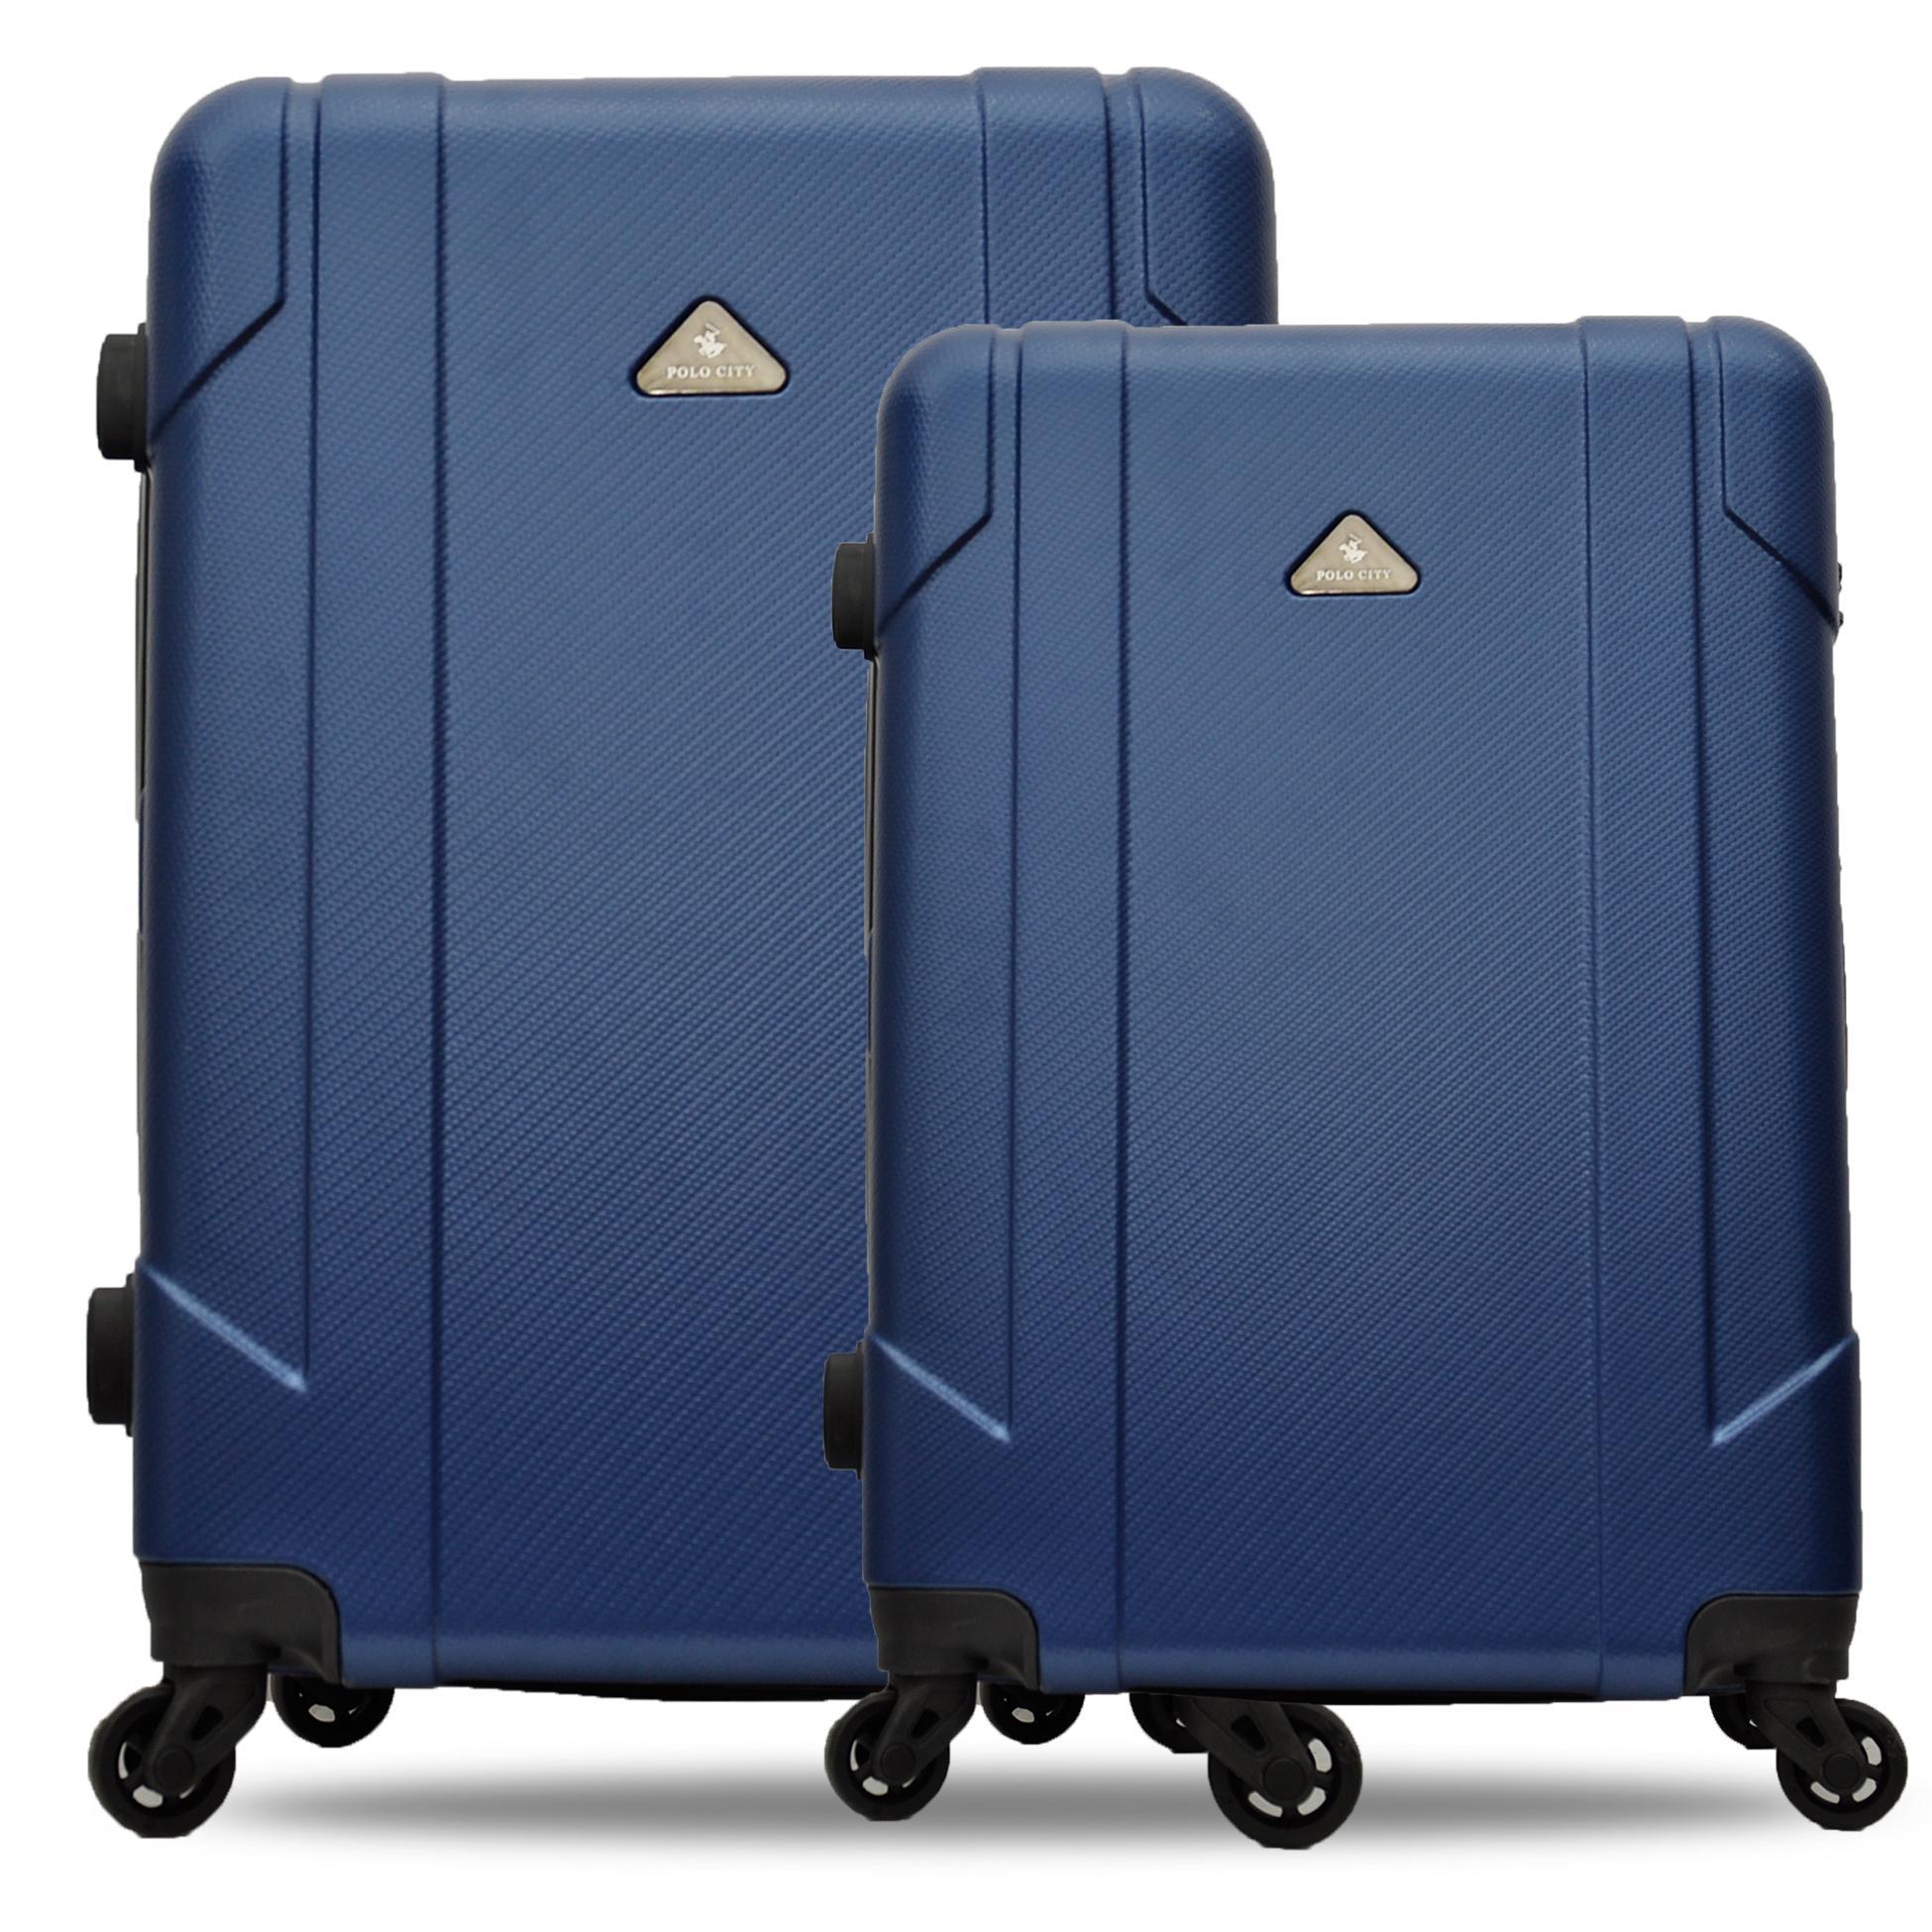 Polo City Tas Koper Hardcase SET size 20+24 inch - 303